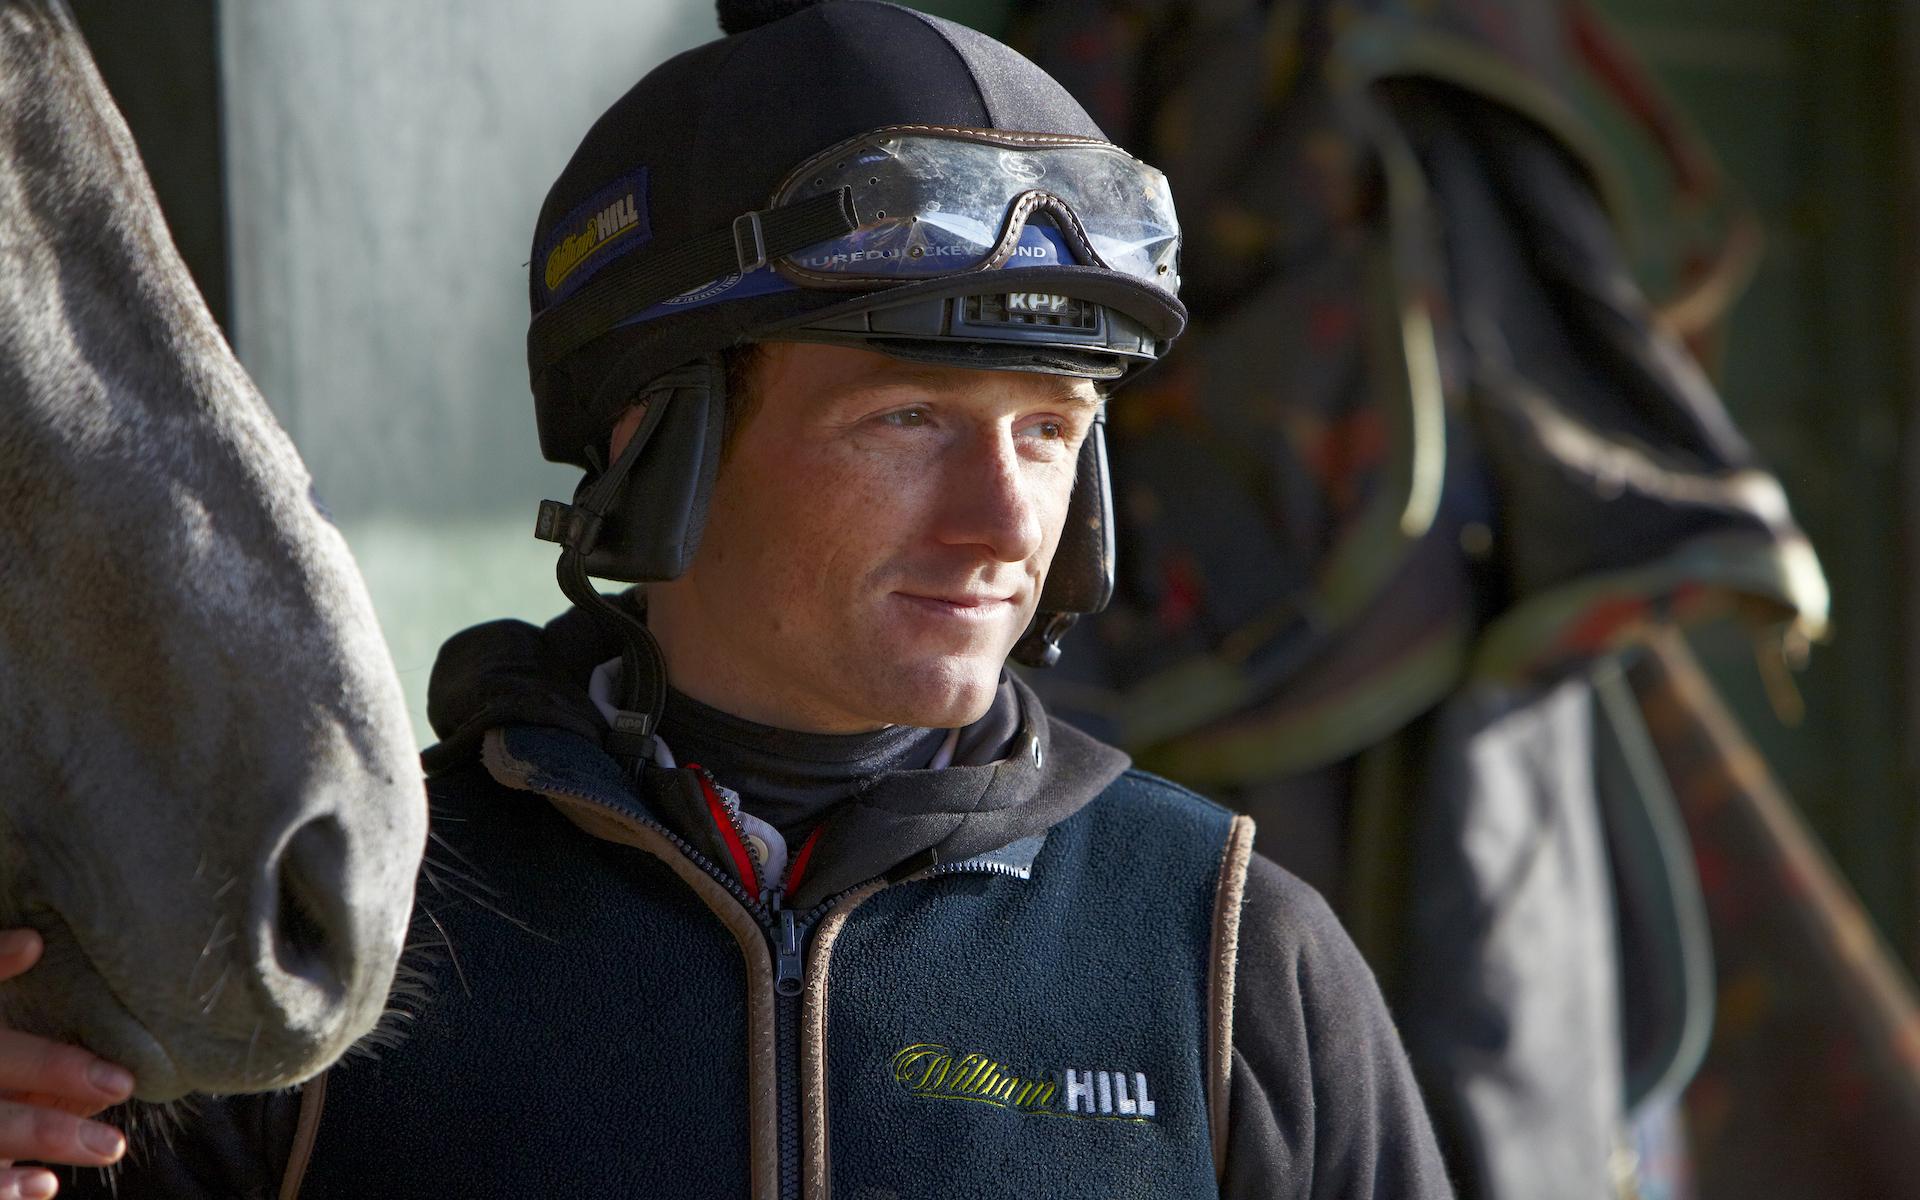 William hill betting shop rules for welding sydney vs brisbane bettingexperts